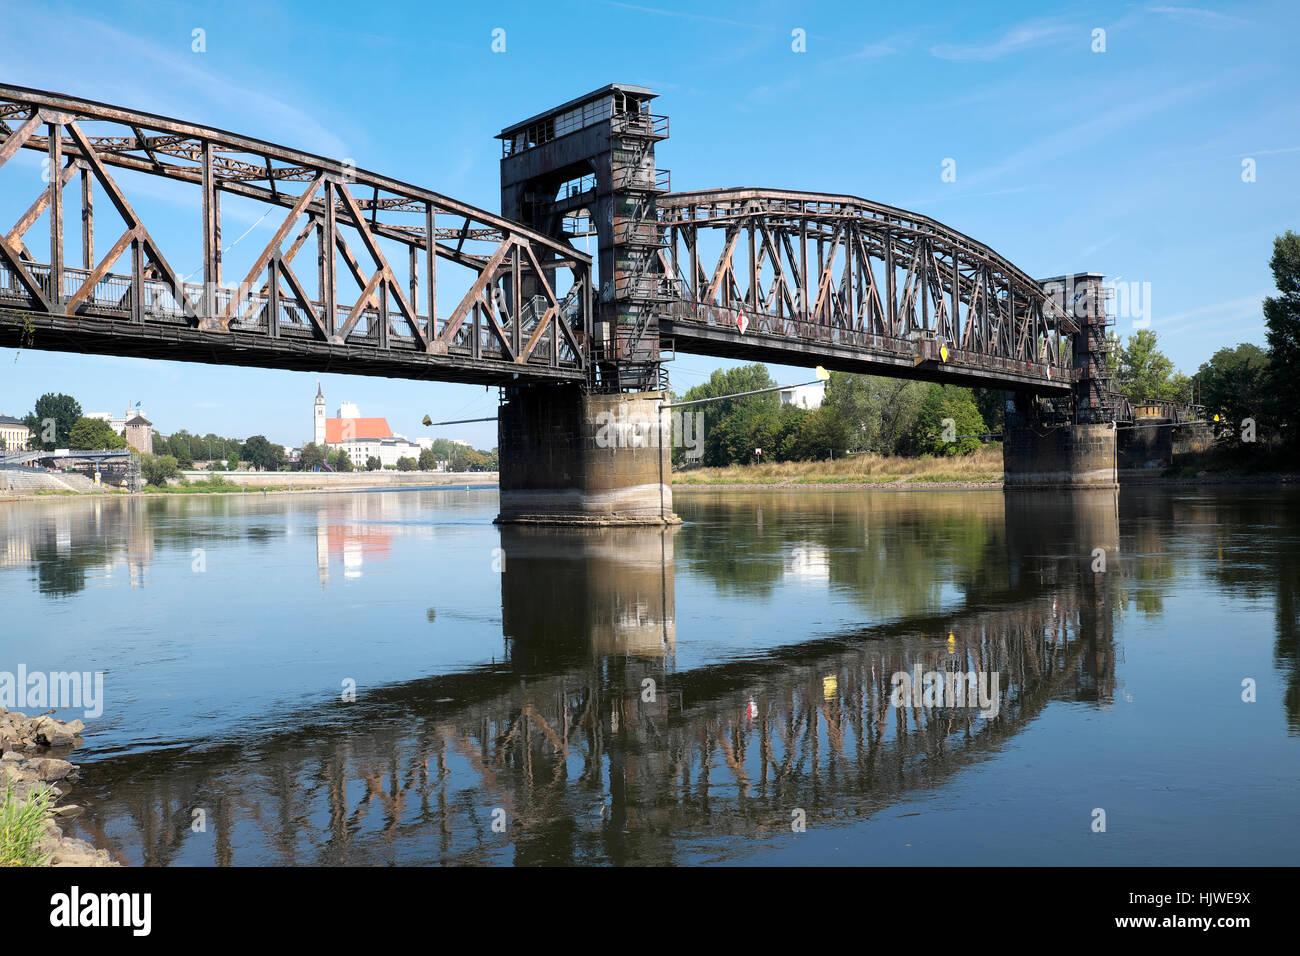 Lift bridge across the Elbe, Magdeburg, Saxony-Anhalt, Germany - Stock Image